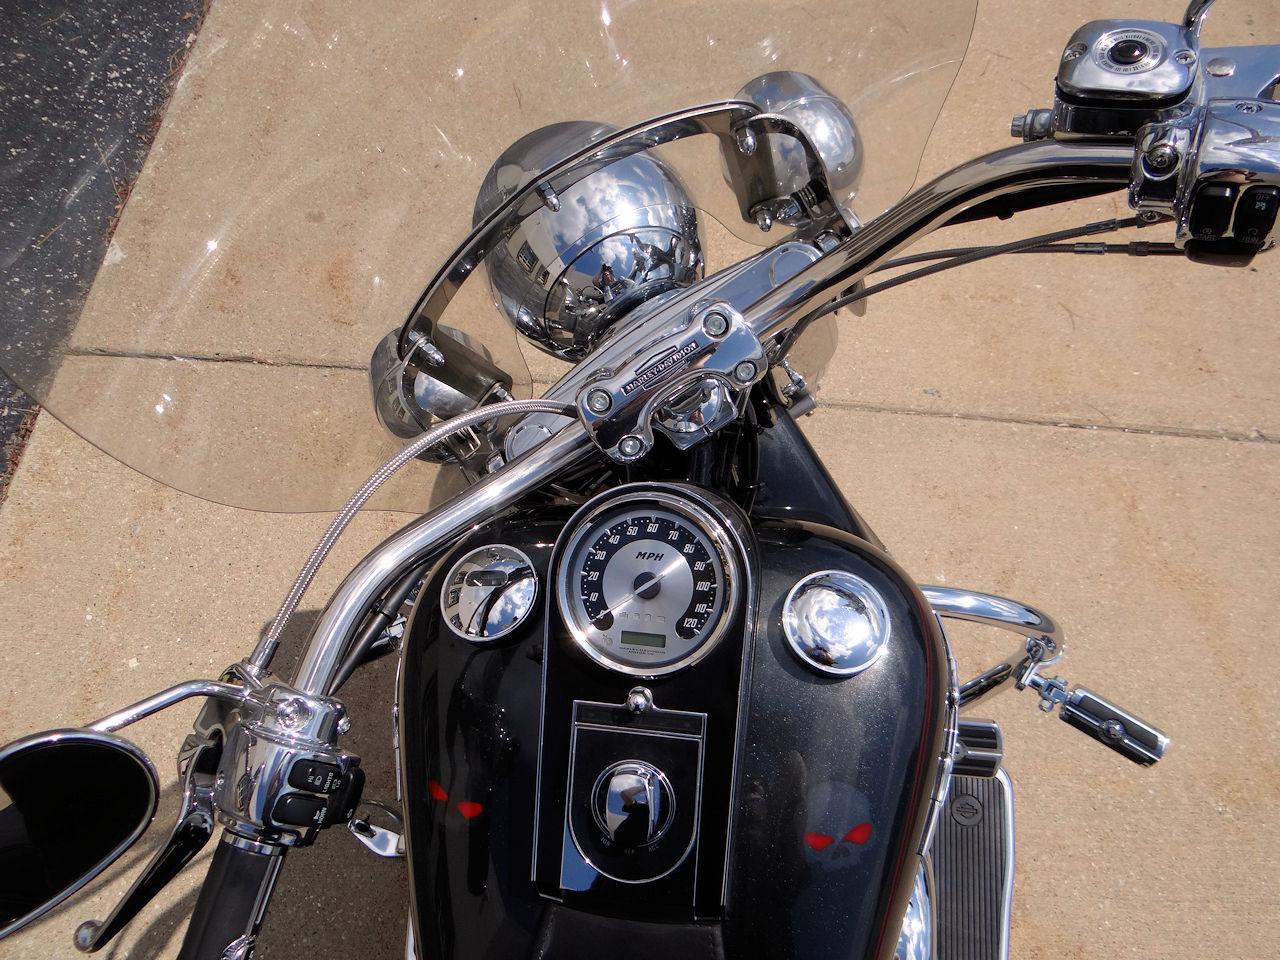 2006 Harley Davidson FLSTNI 9